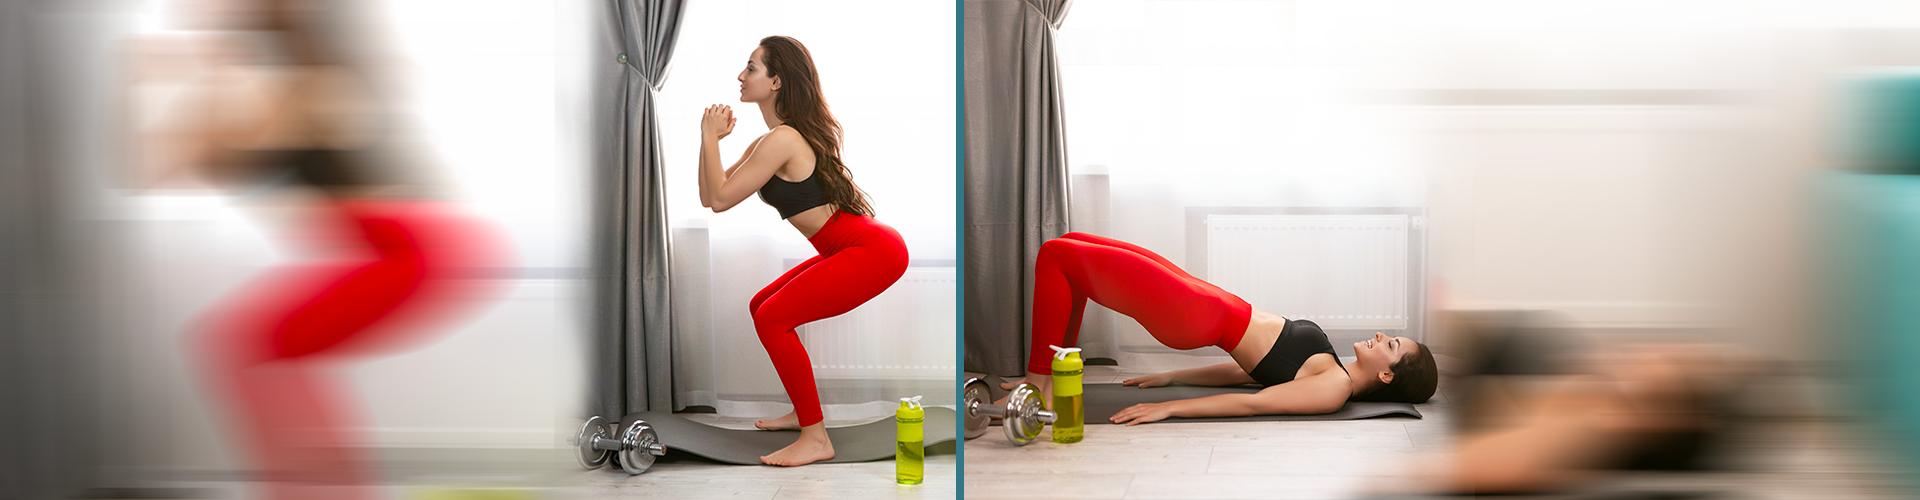 SLIDE-BLOG-hip-thrust-squat